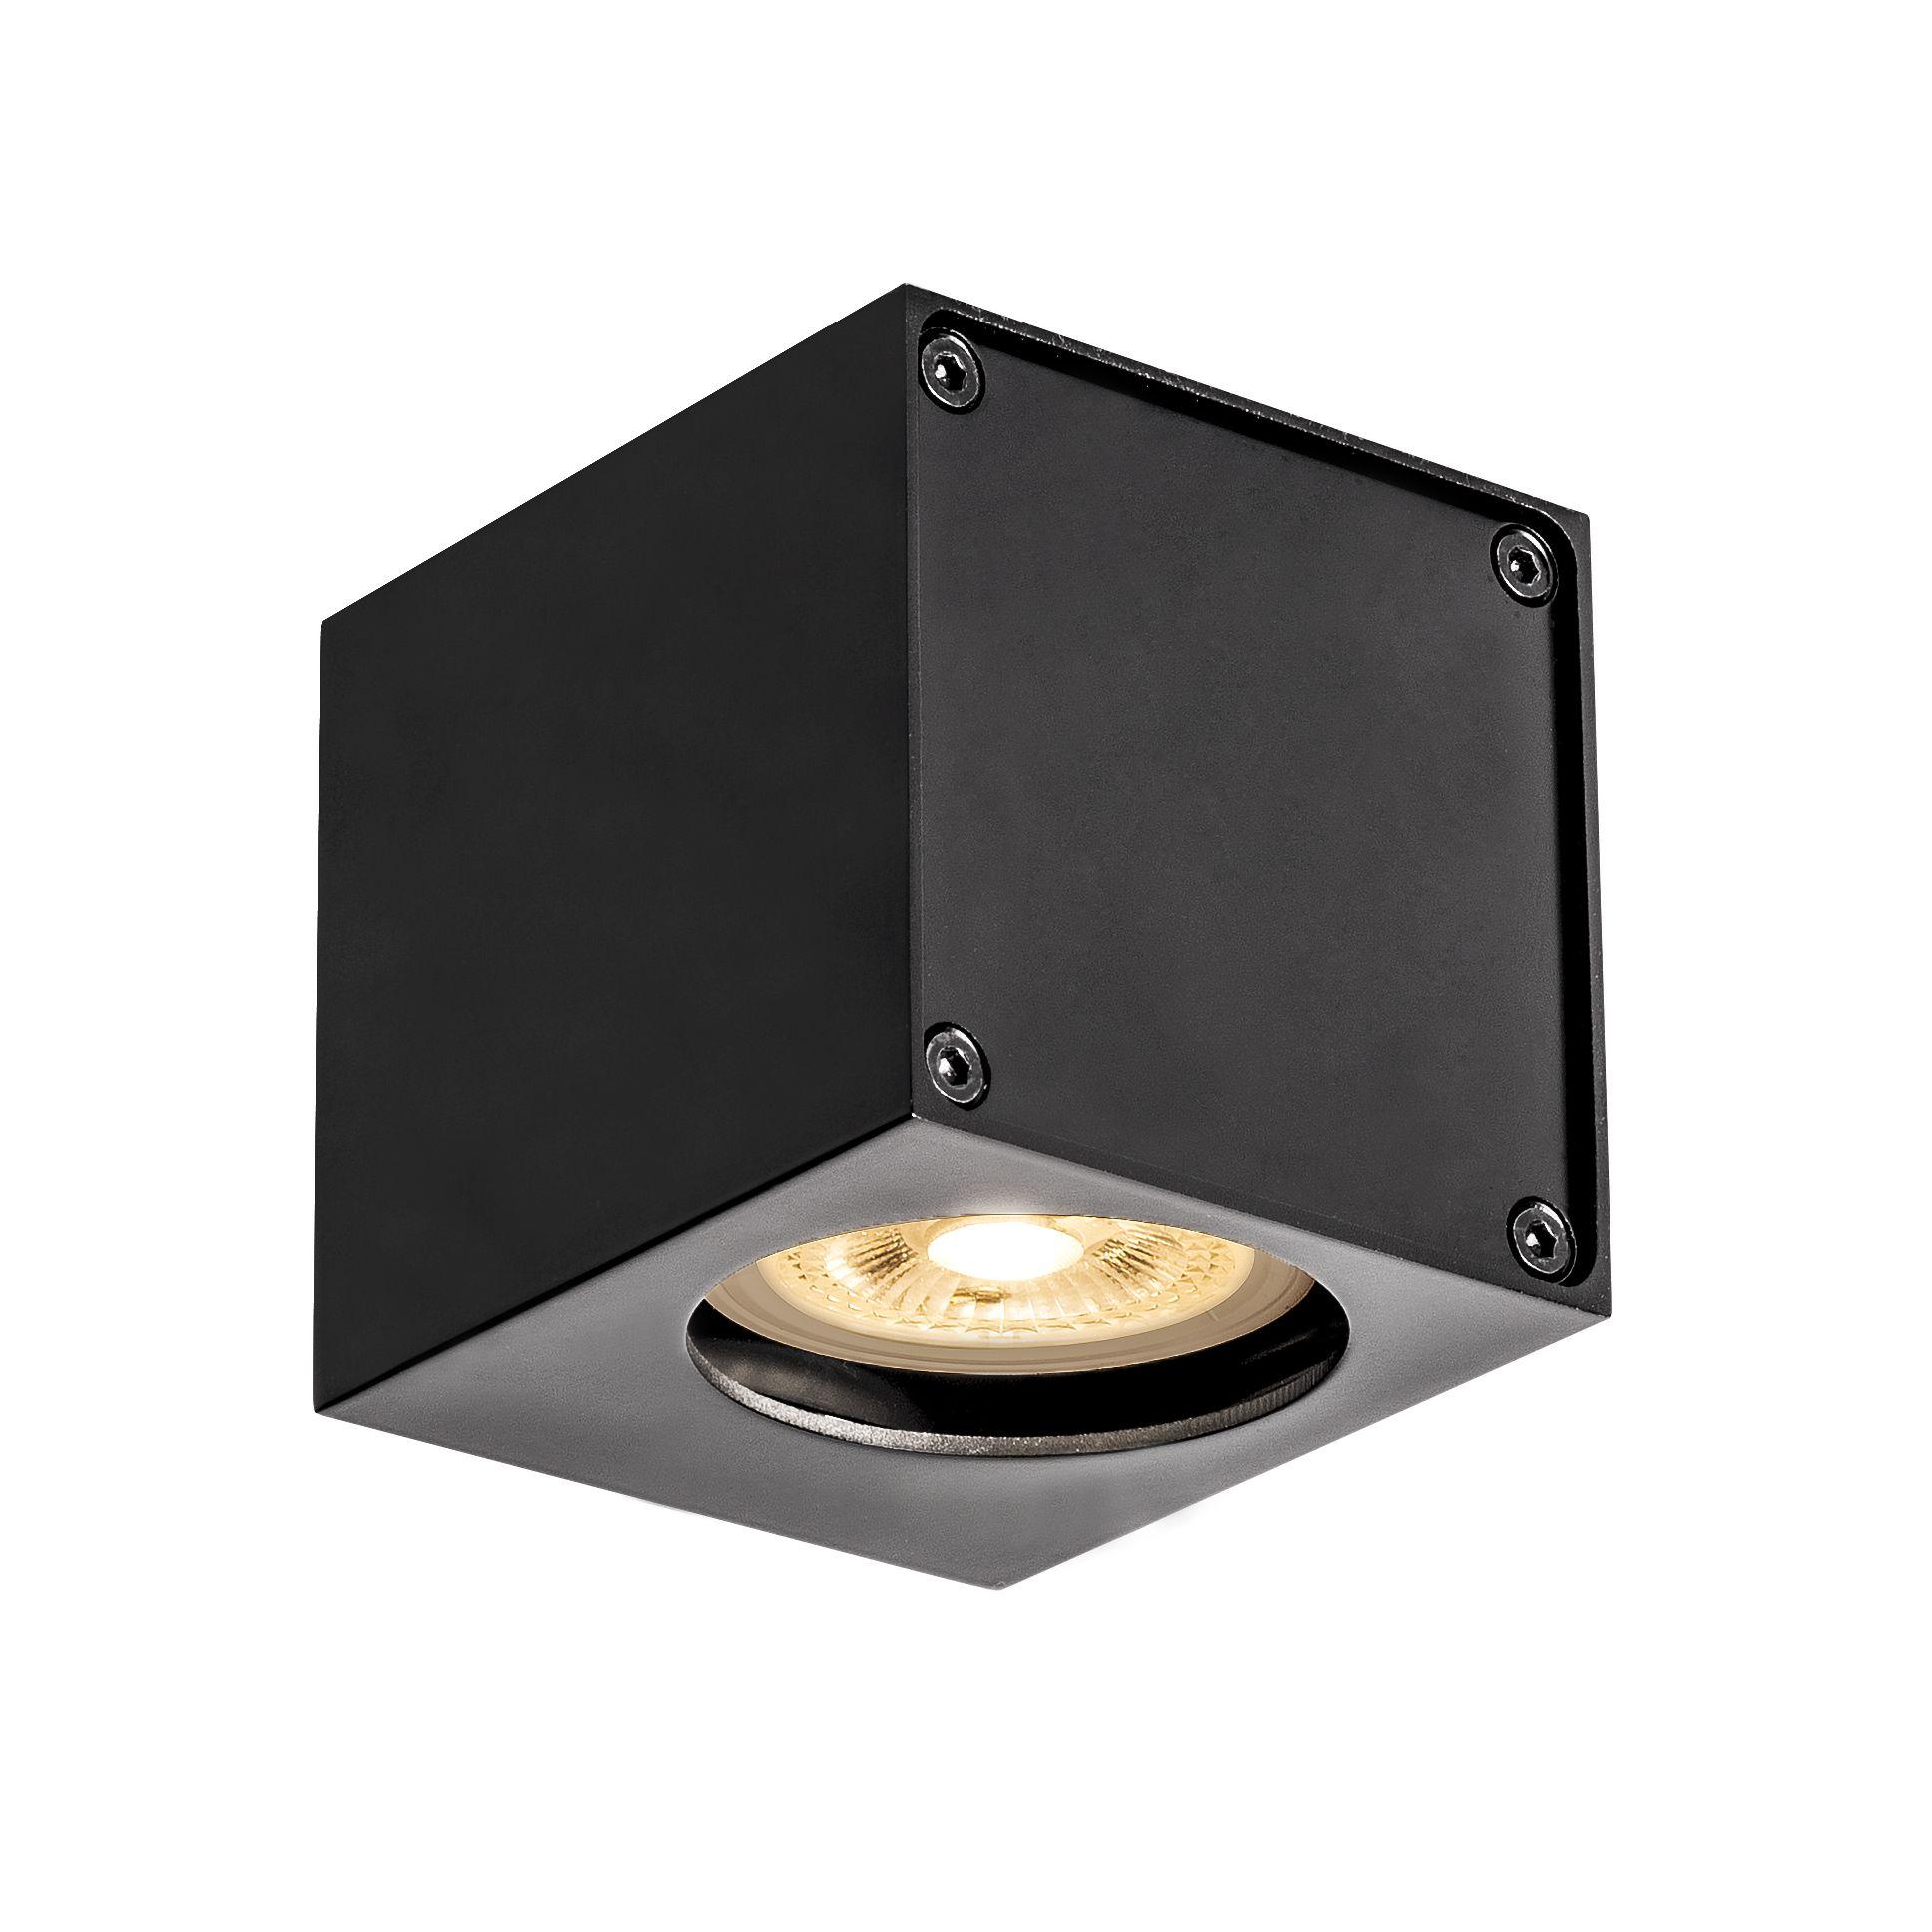 1 Stk ALTRA DICE WL-1, Indoor Wandaufbauleuchte, QPAR51, schwarz LI1002212-